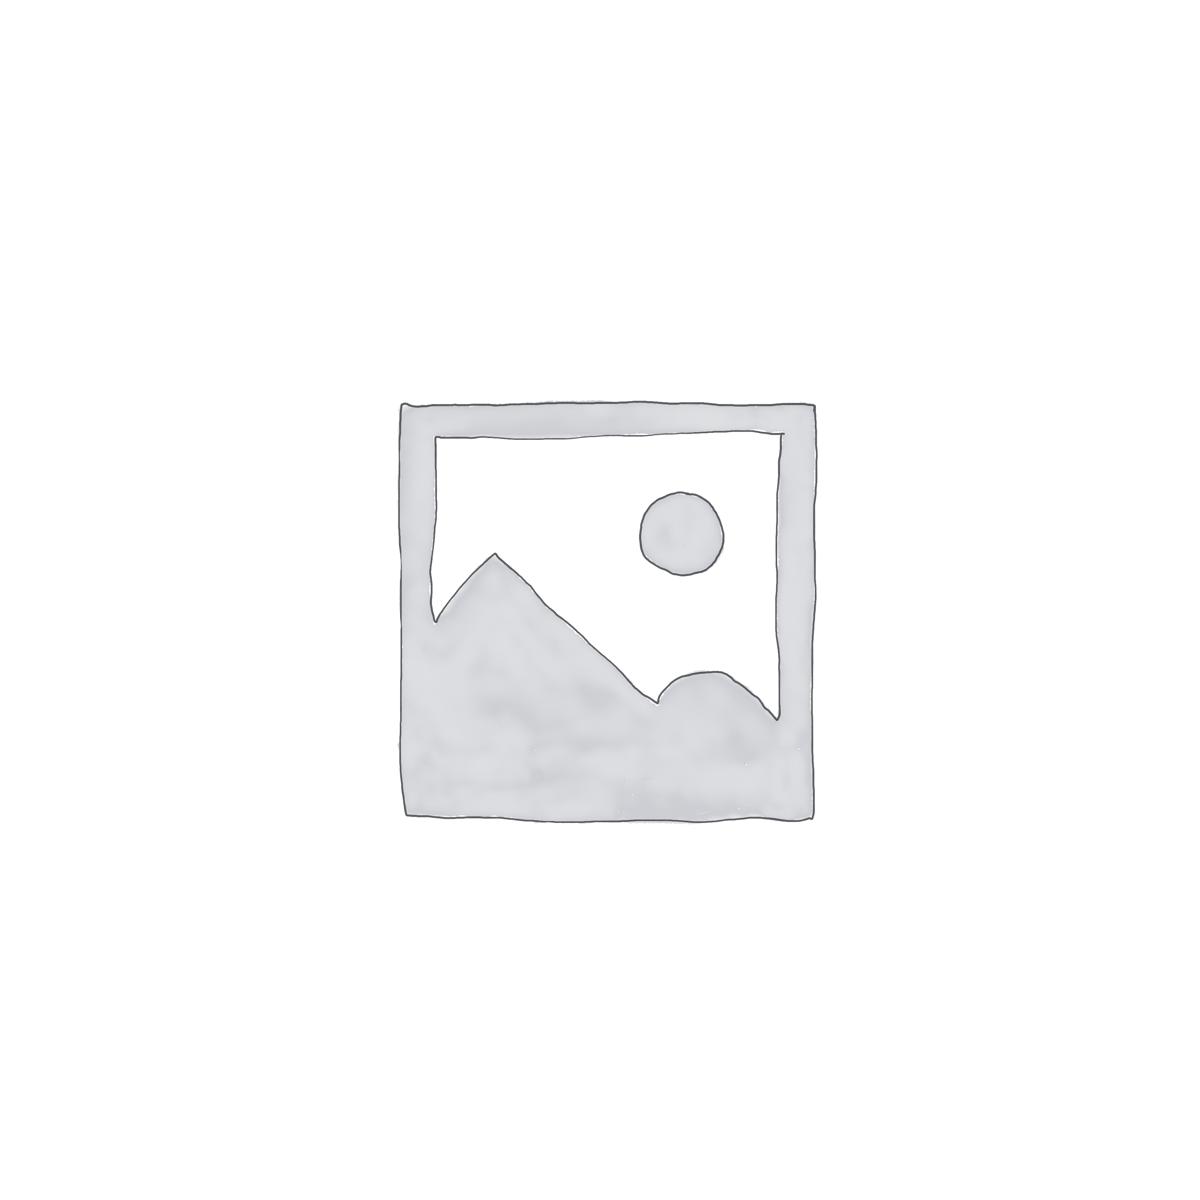 Foggy Pine Forest Landscape Wallpaper Mural